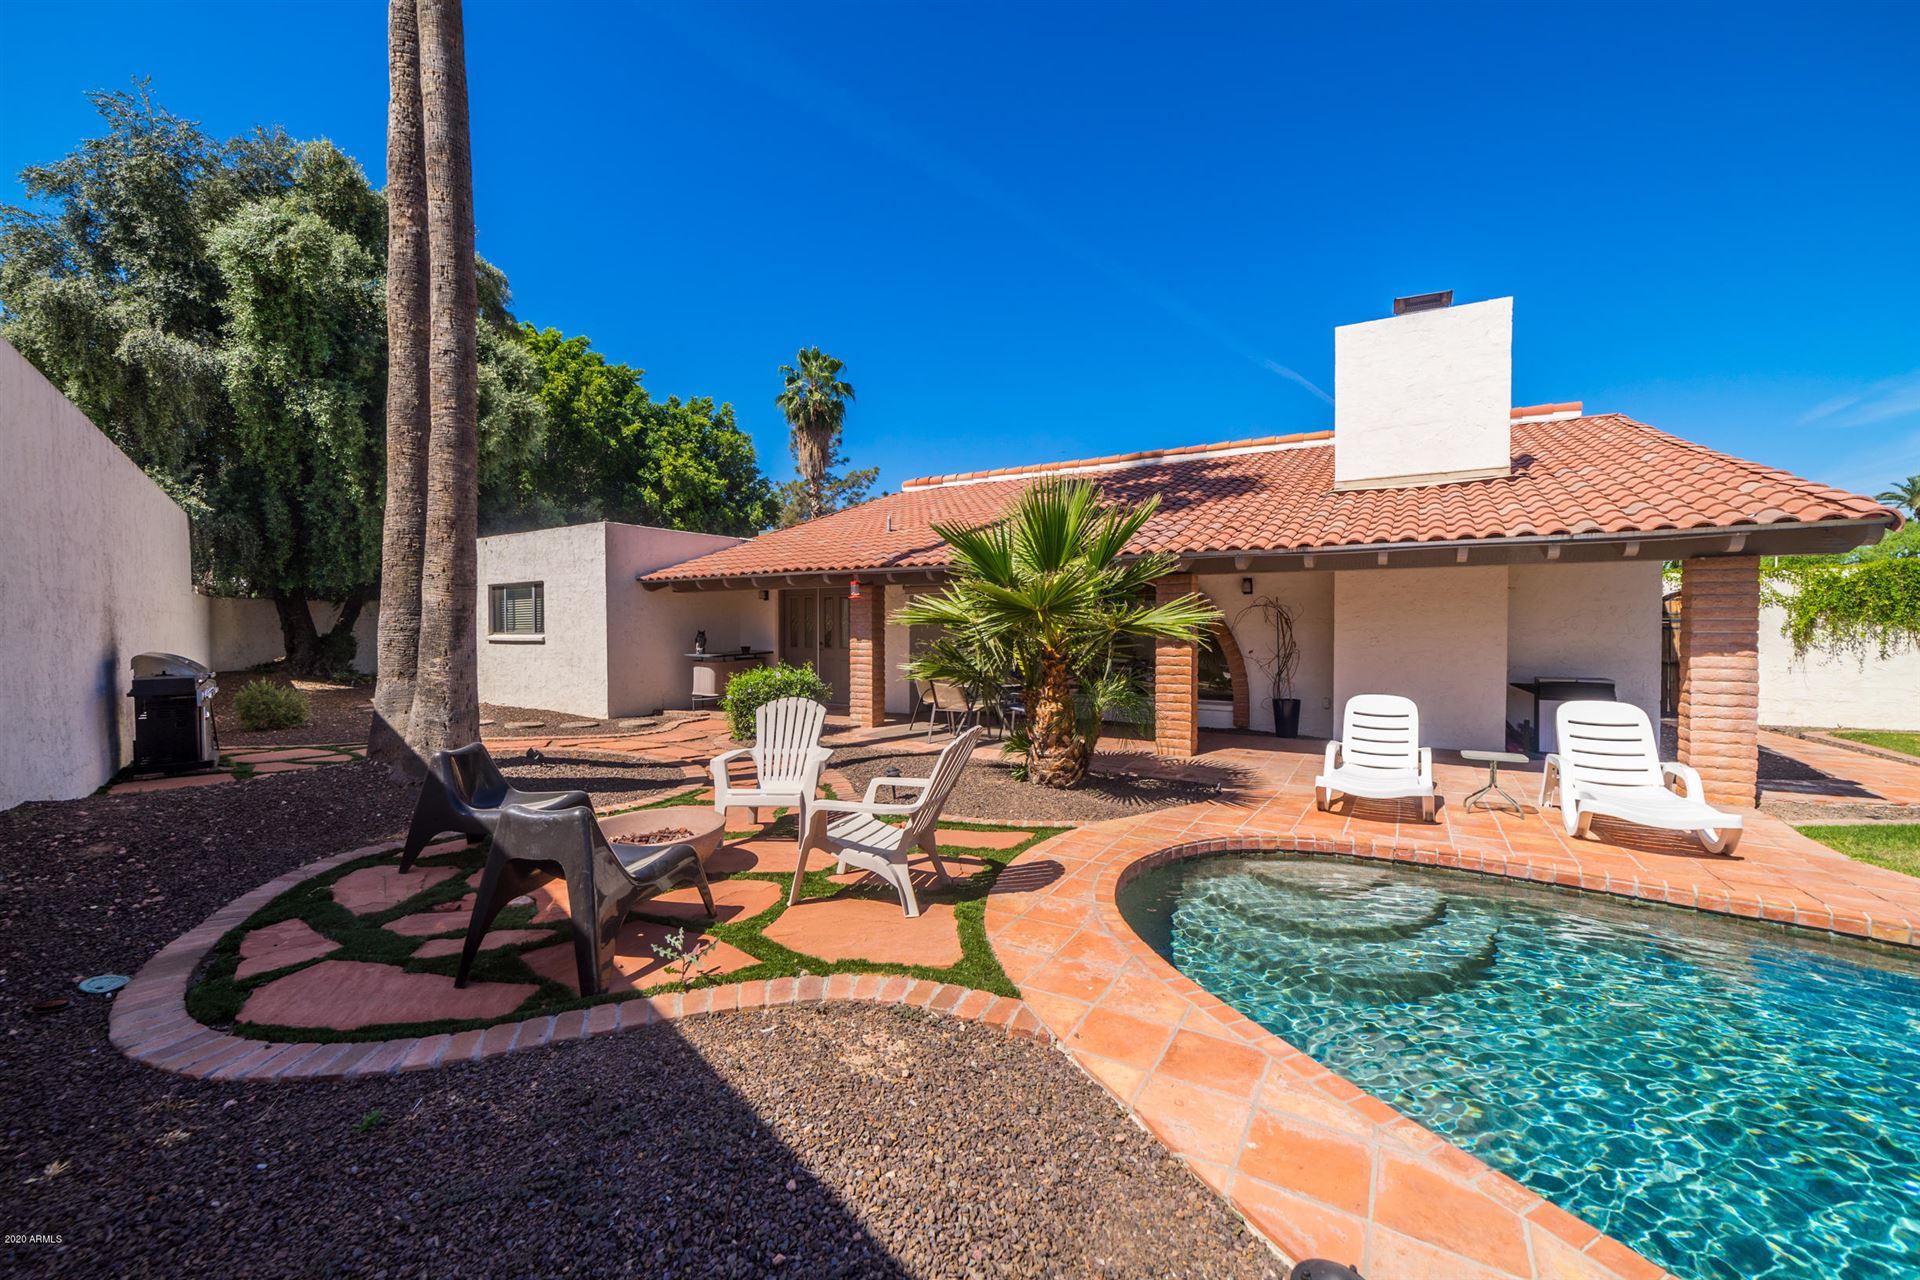 3021 E WELDON Avenue, Phoenix, AZ 85016 - MLS#: 6068114